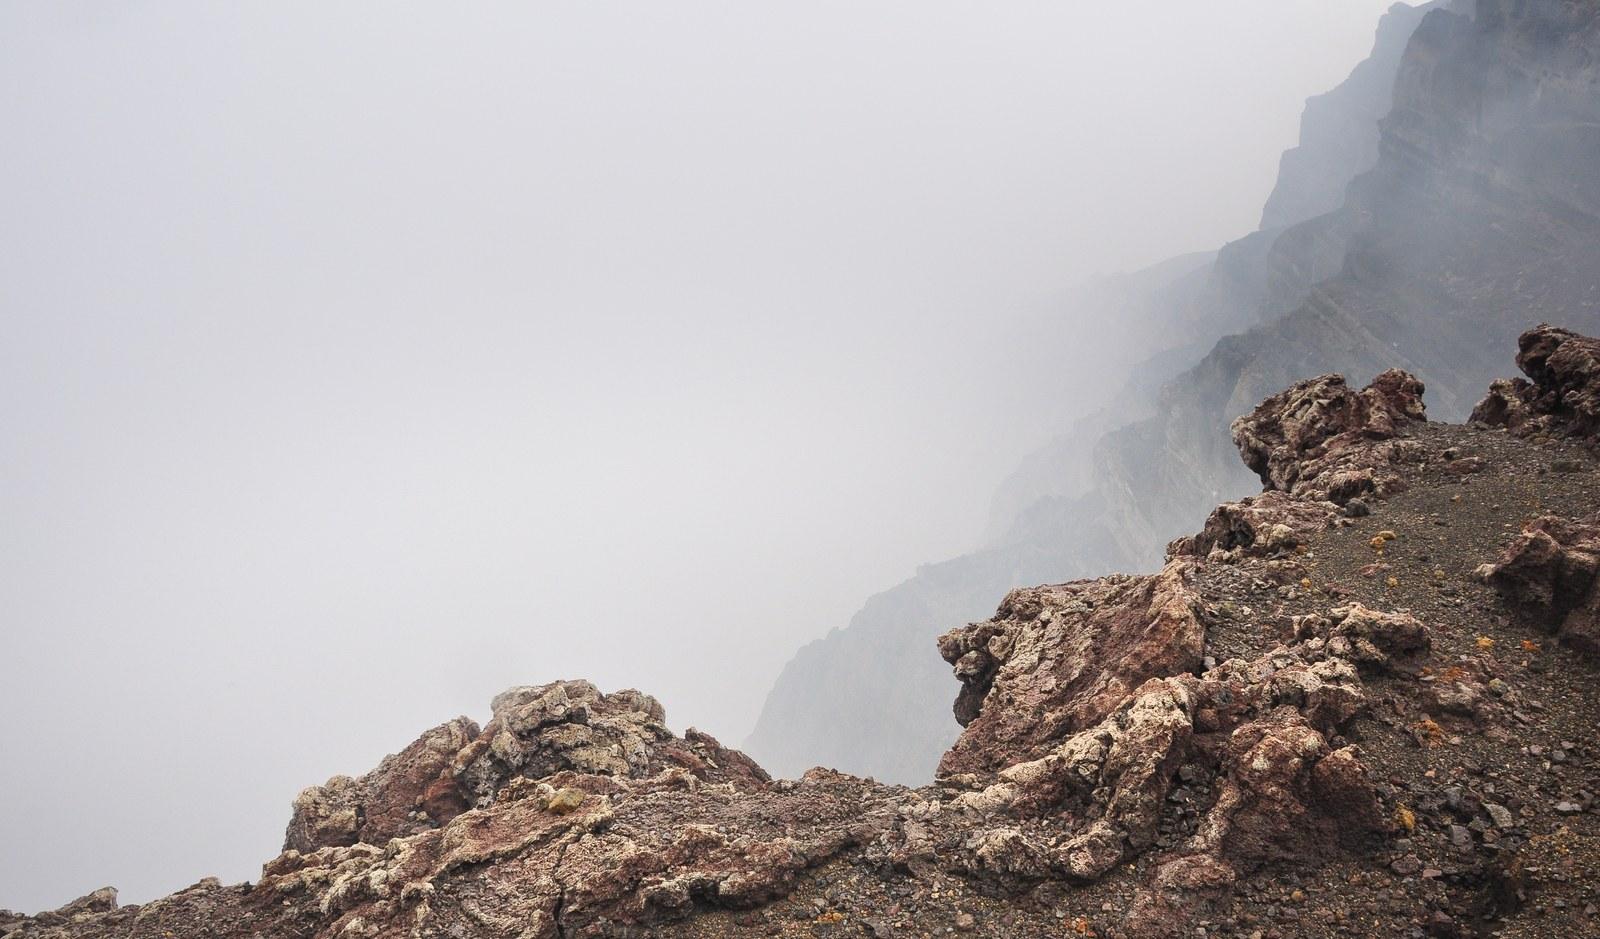 Cratère du volcan Masaya au Nicaragua Masaya